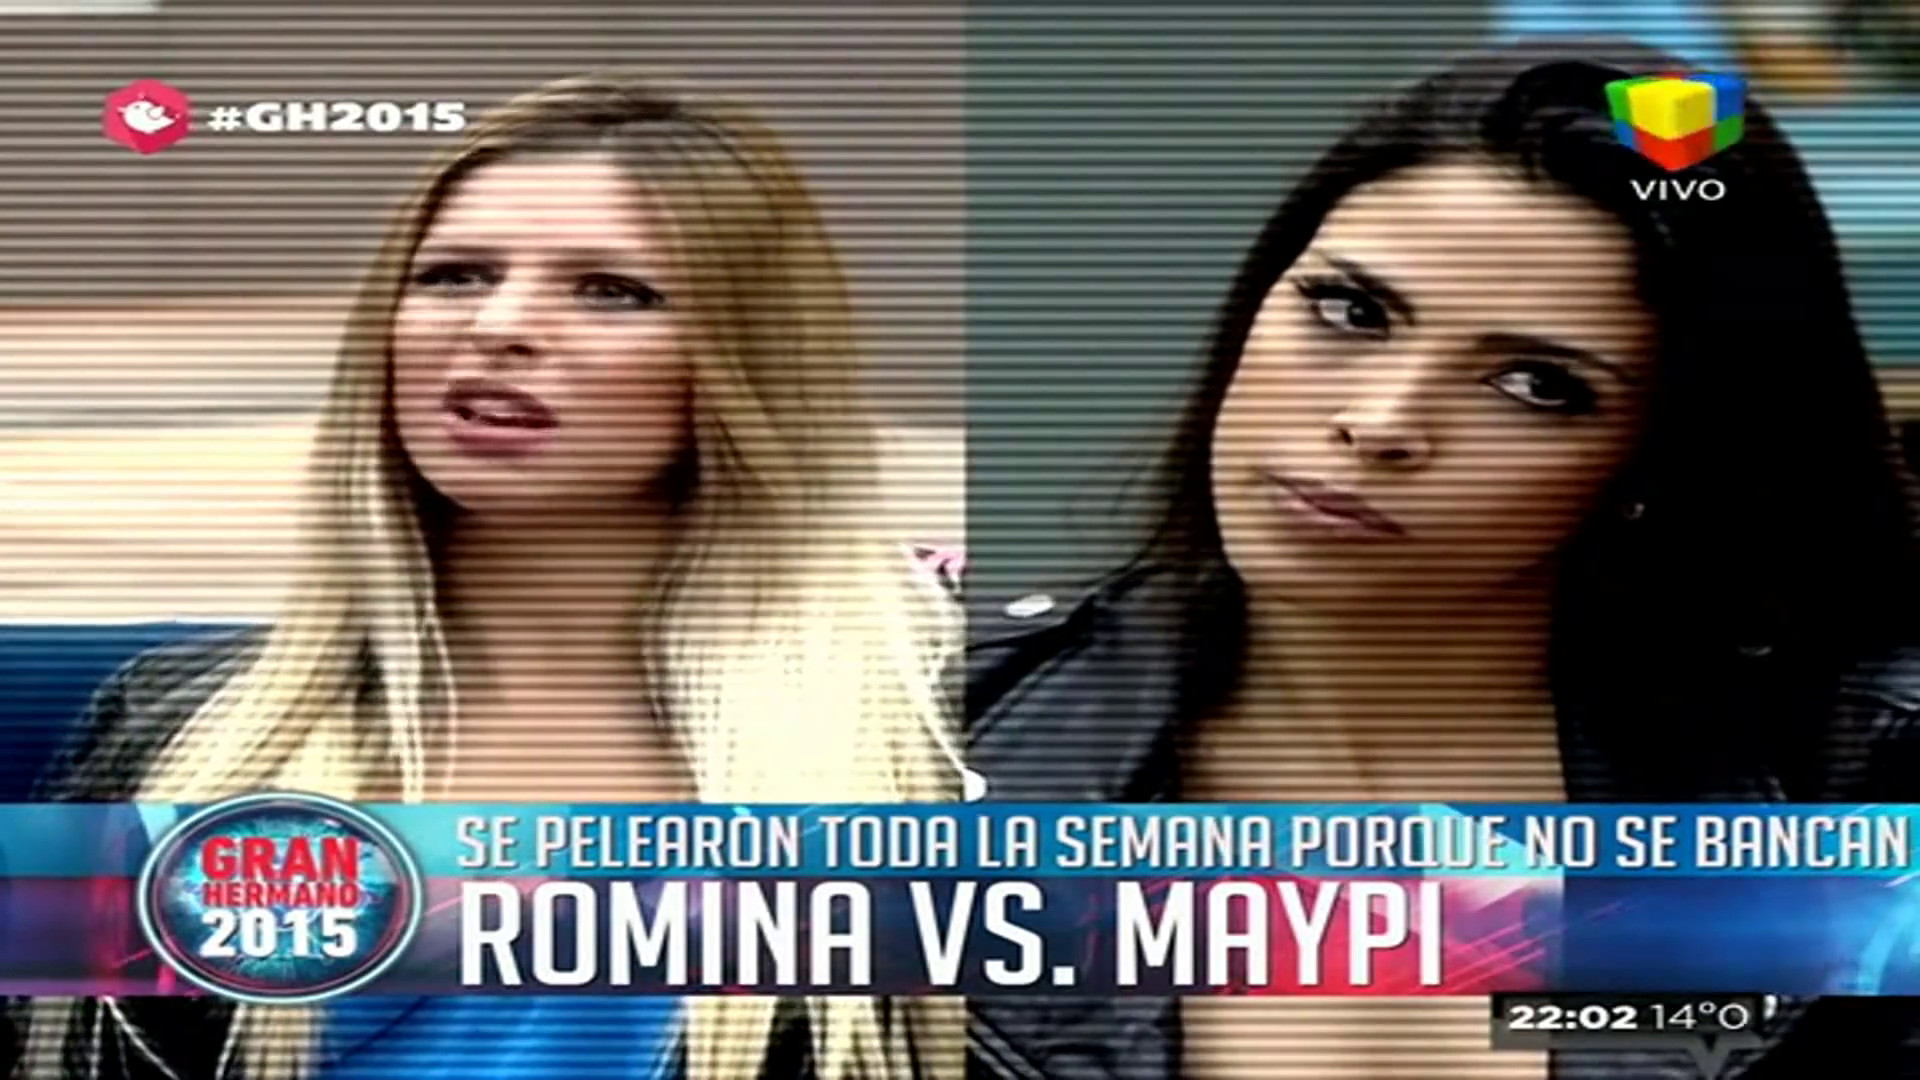 Romina Malaspina y Maypi Delgado Gran Hermano 2015